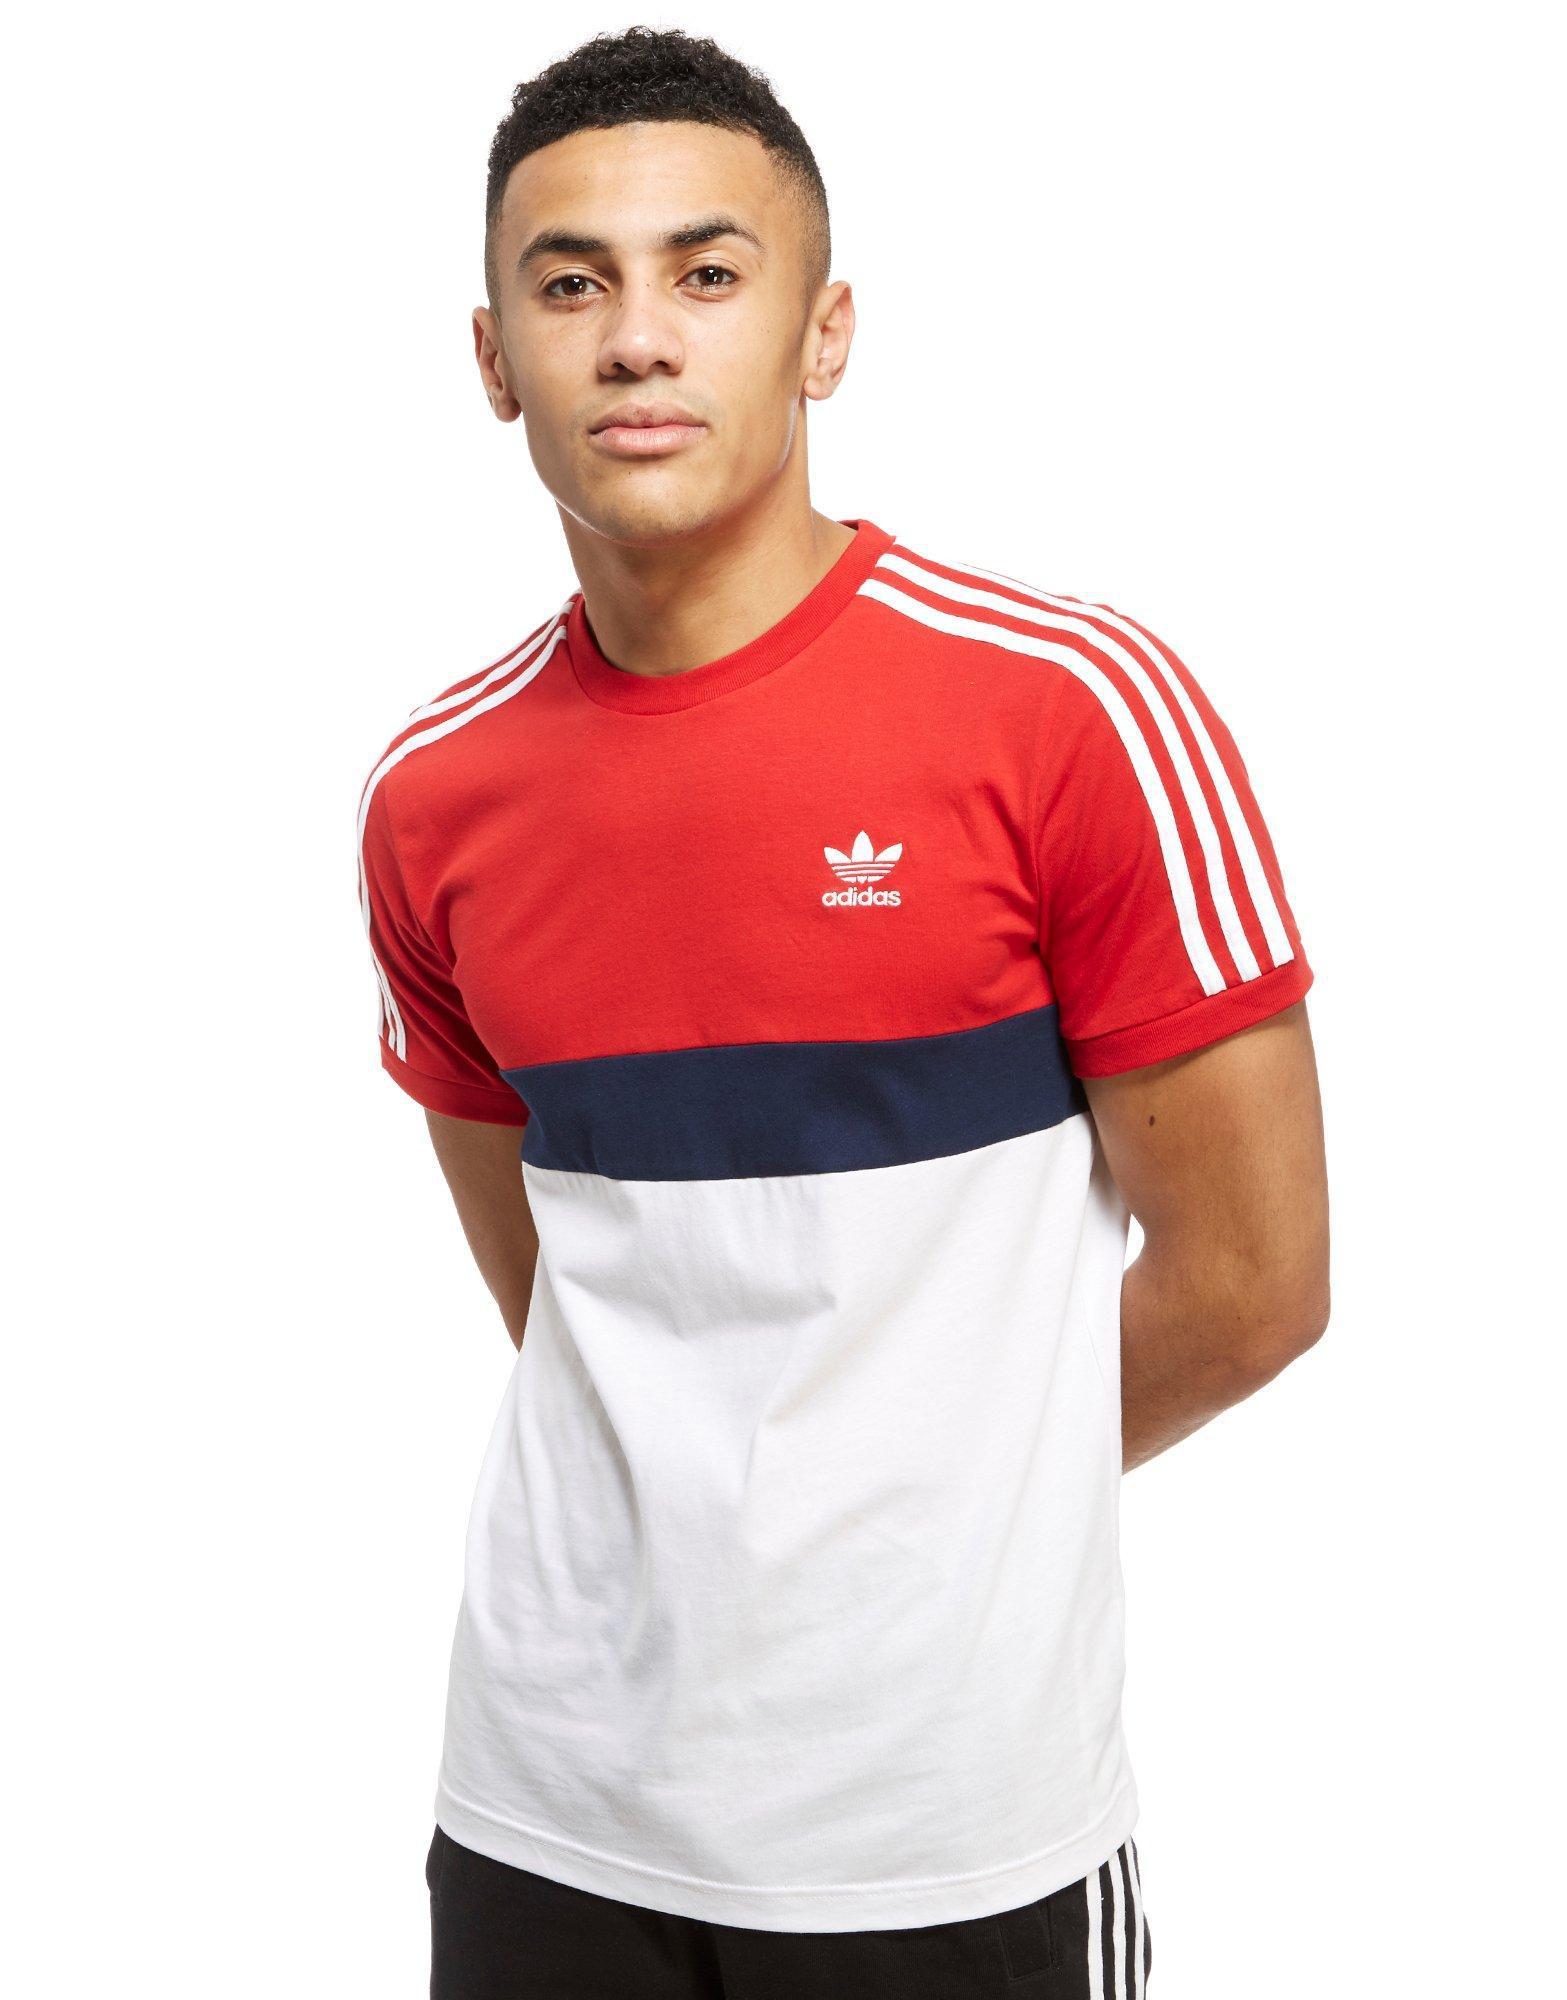 adidas Originals Cotton California 2 T-shirt in Red/White (Red ...